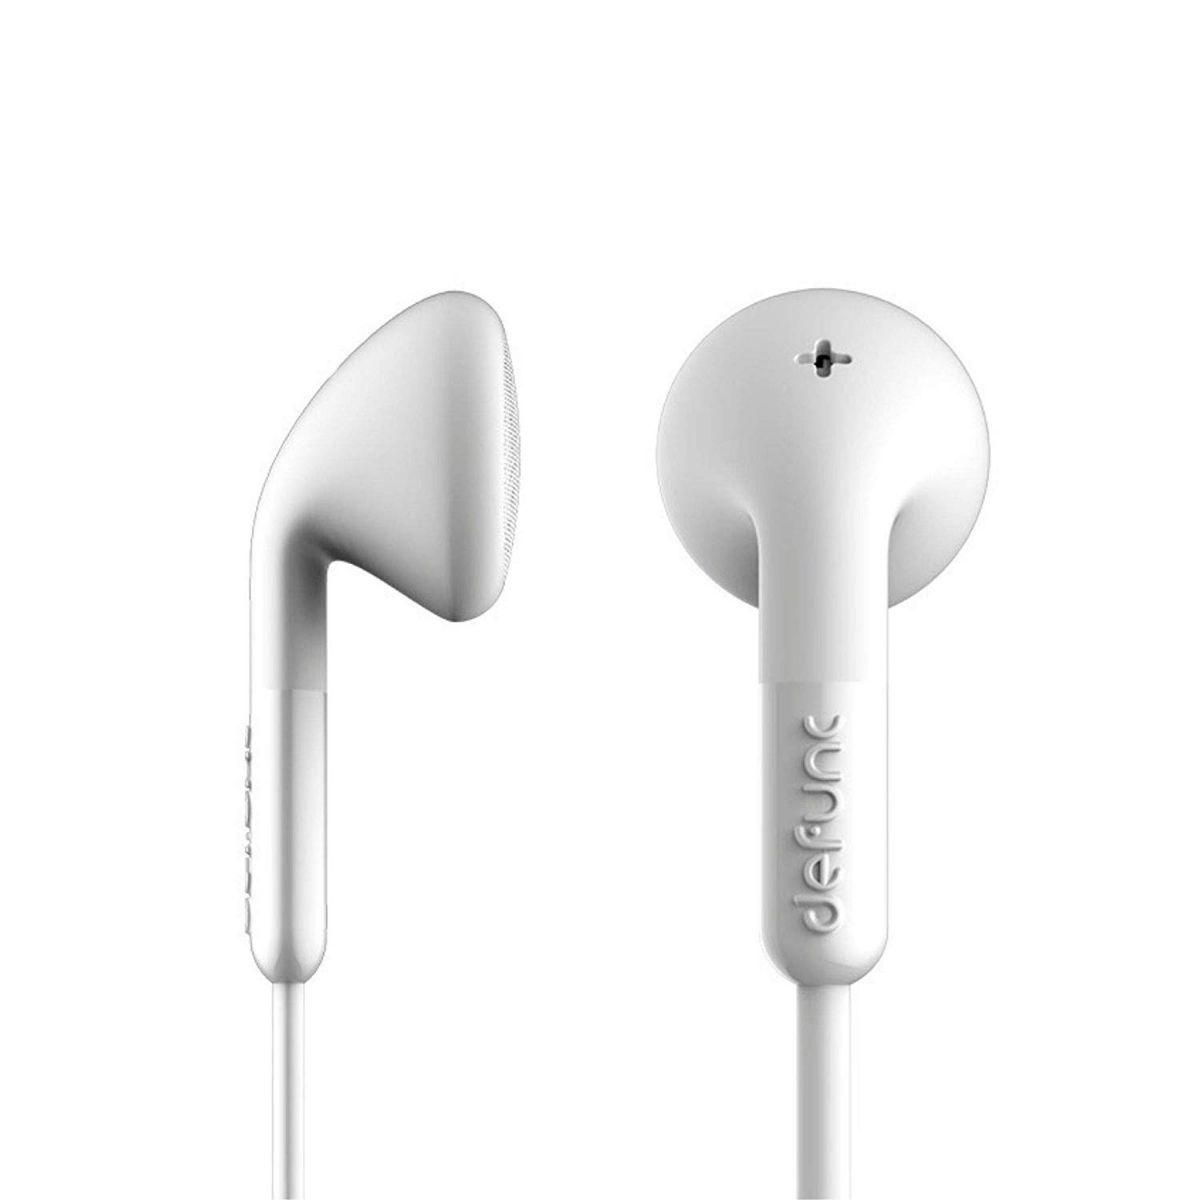 Defunc Plus TALK D0012 In-Ear Wired Earbud Headphones - White